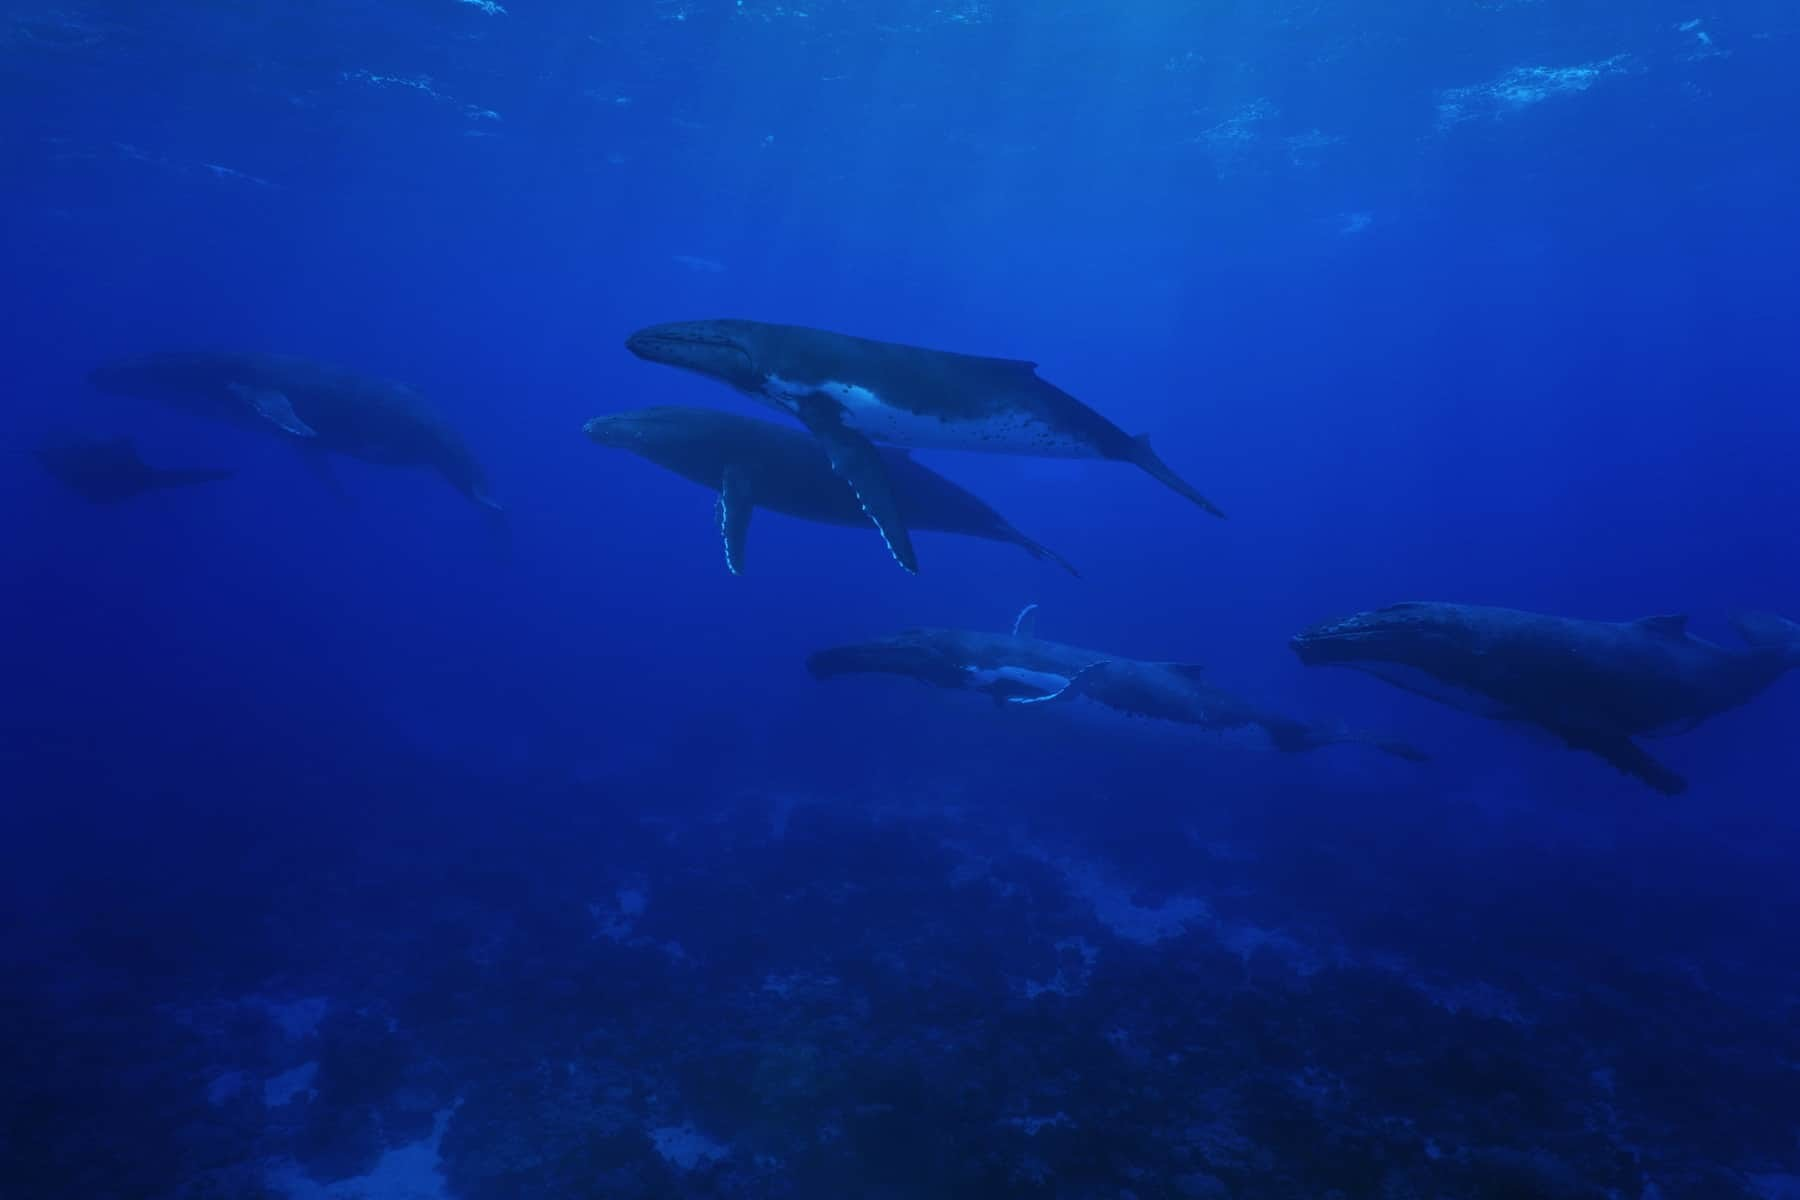 Group of humpback whales underwater Pacific ocean